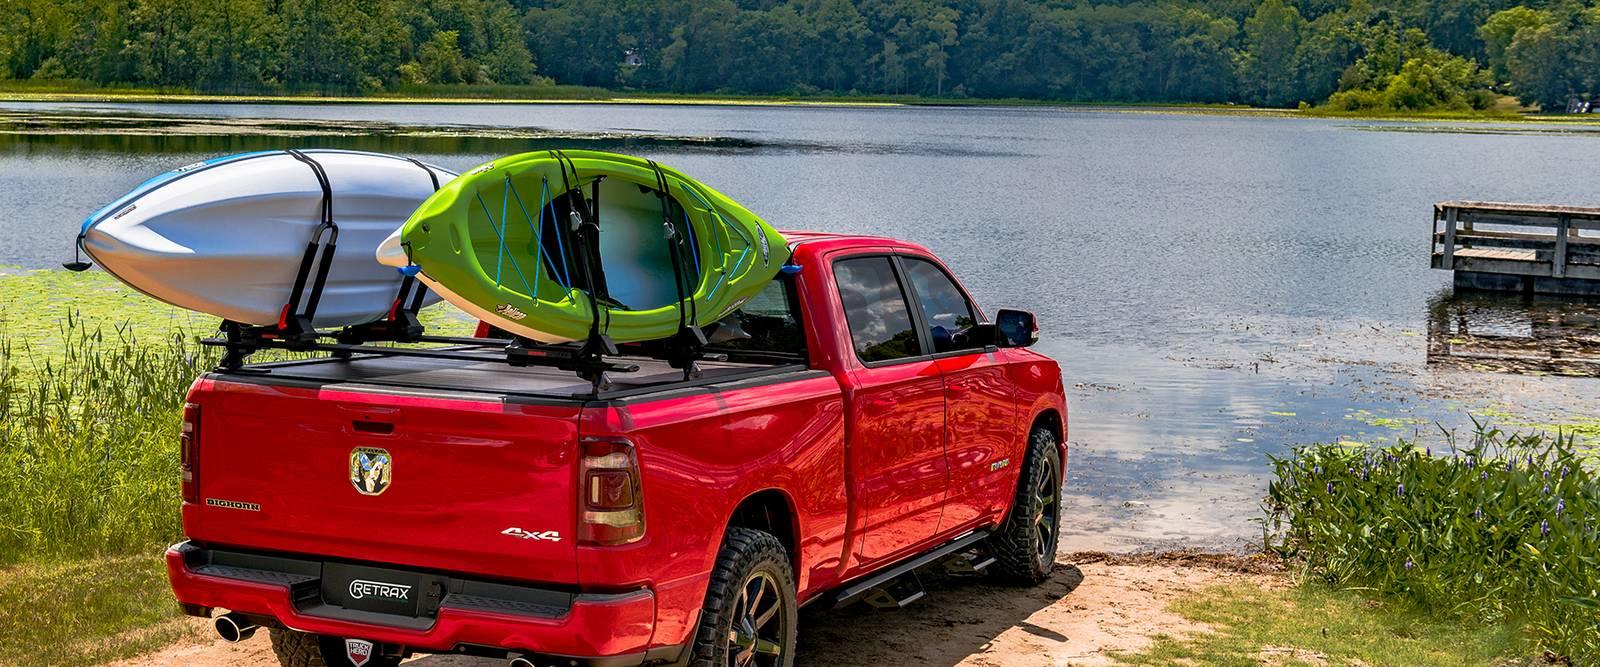 Retractable Tonneau Covers Retrax Truck Bed Covers